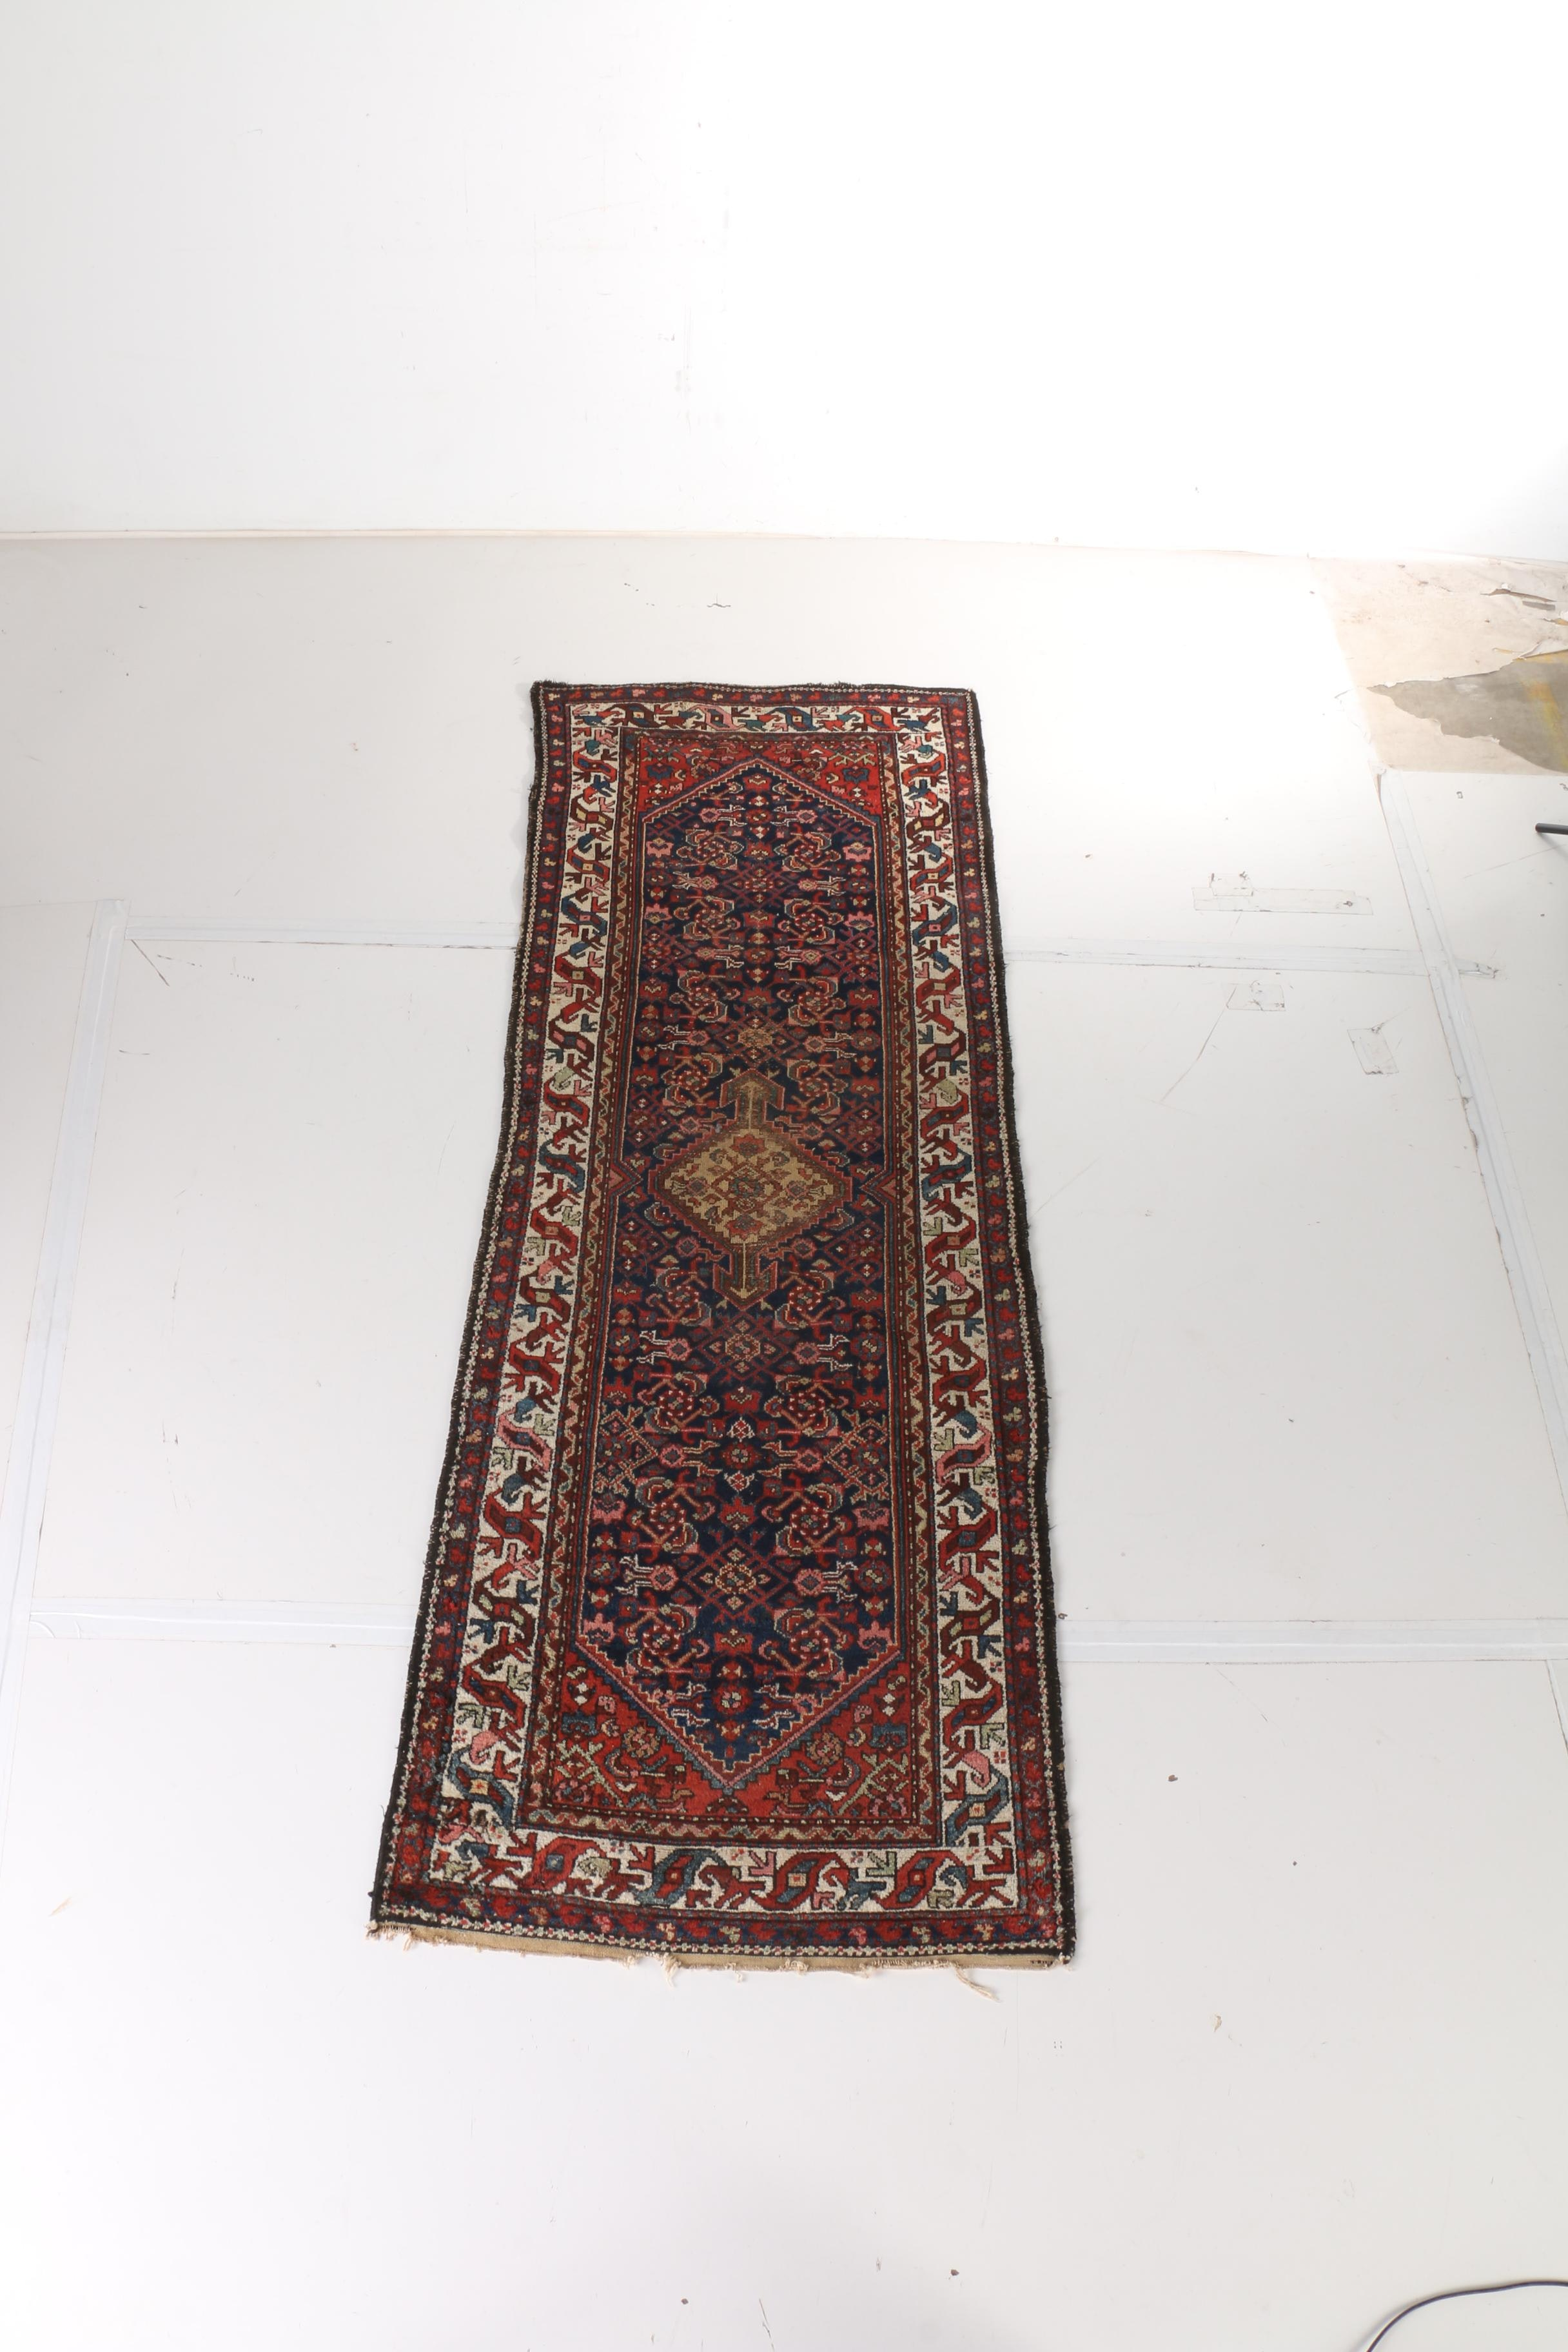 Semi-Antique Hand-Knotted Persian Shiraz Runner